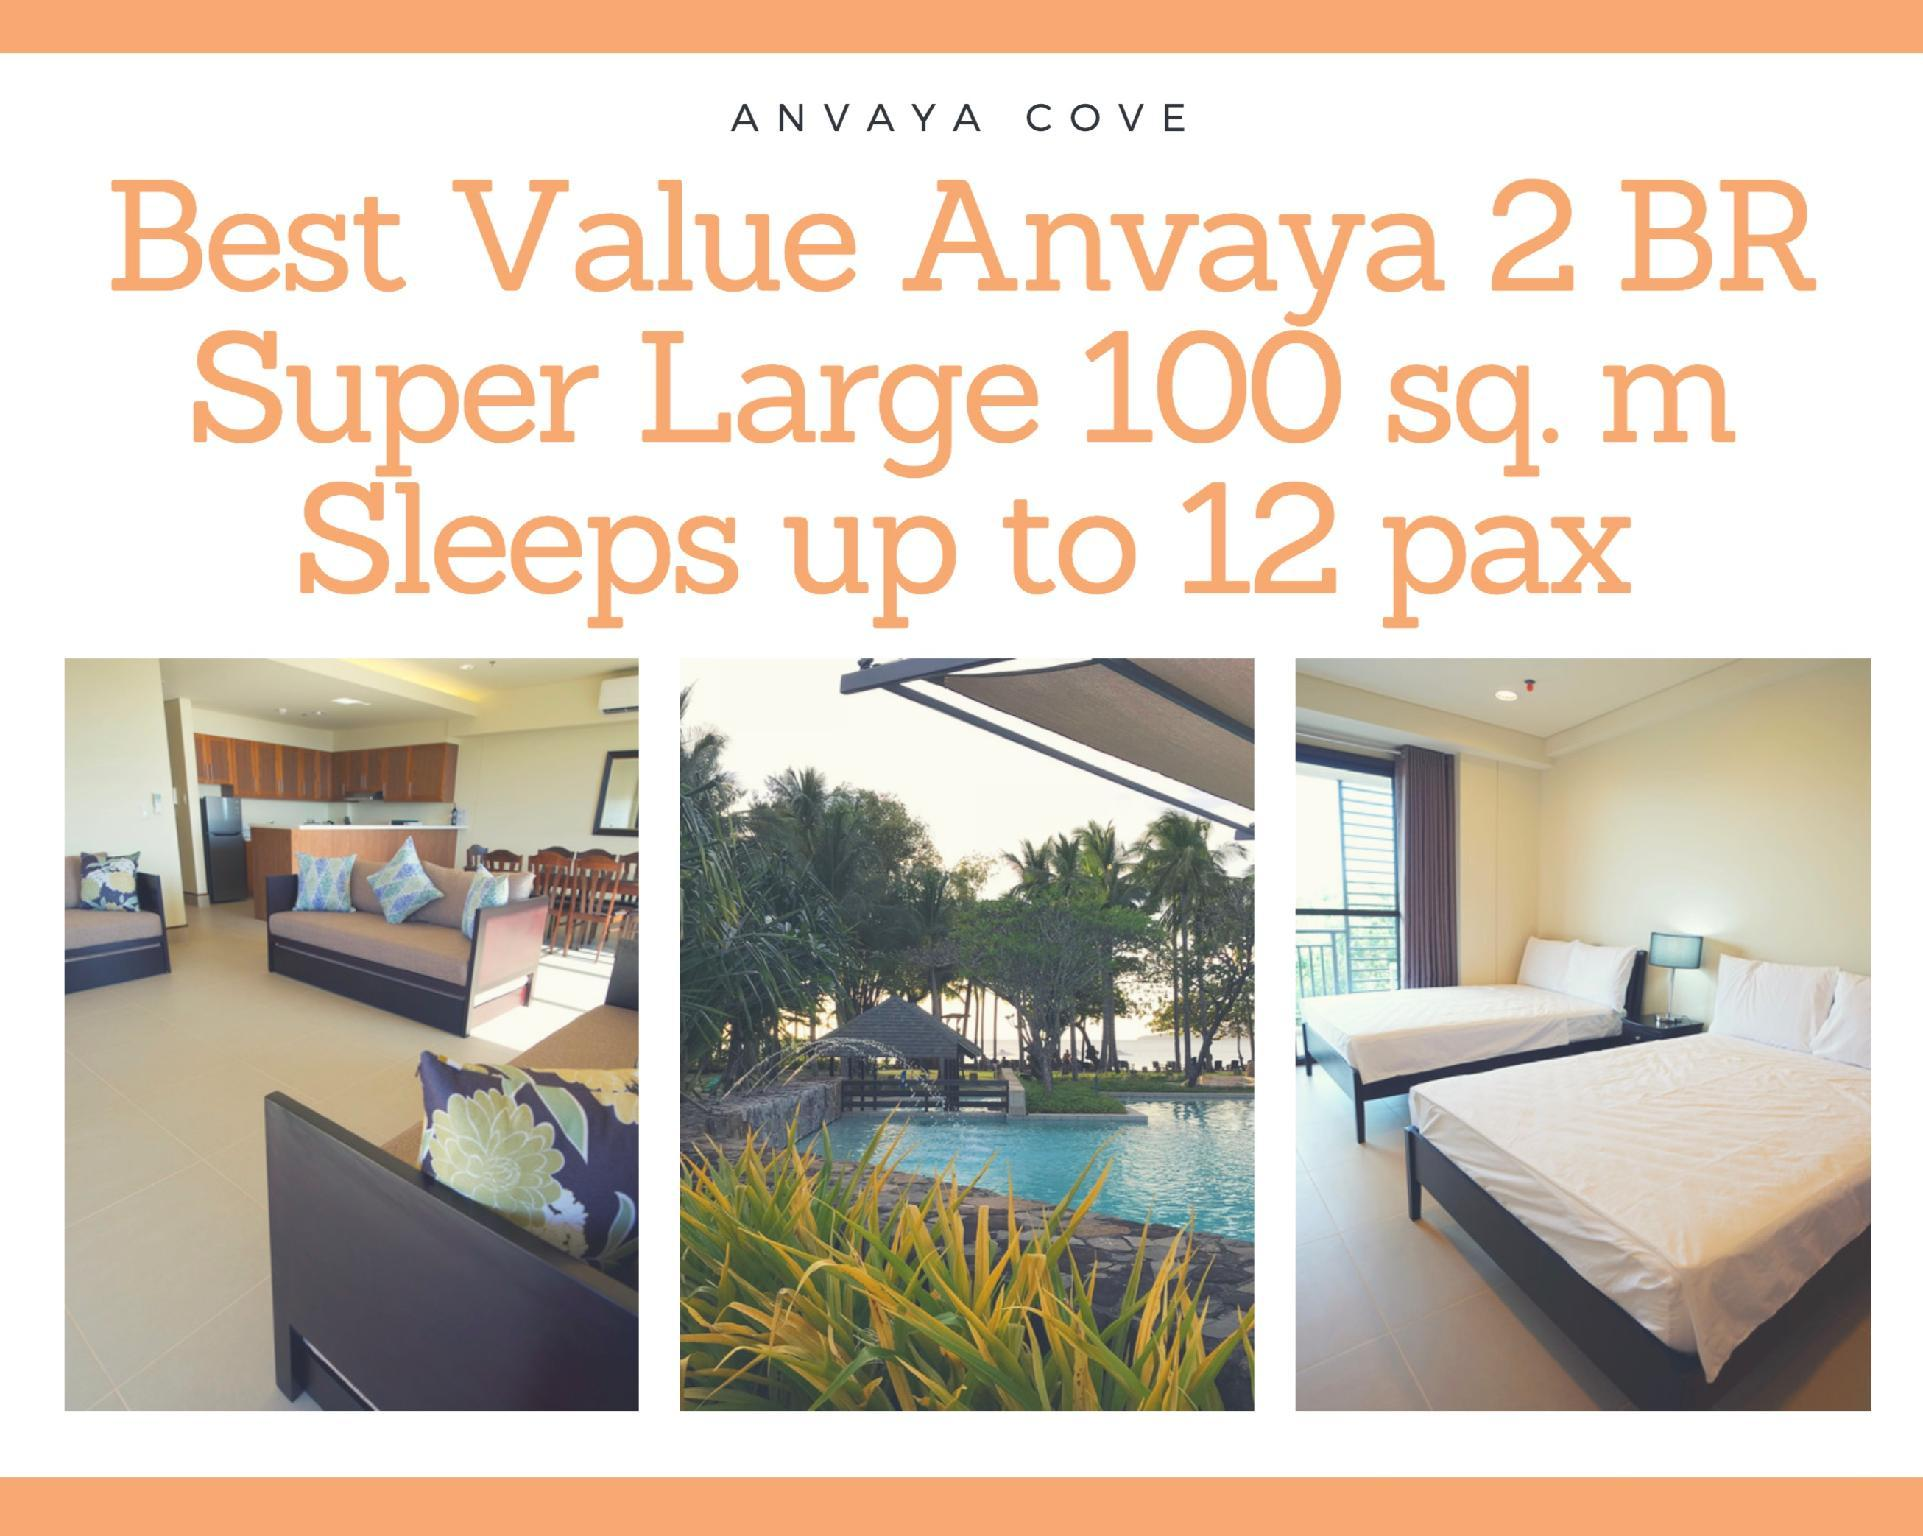 Anvaya Cove Sea View Condo 2 BR 2BA WiFi Netflix 5